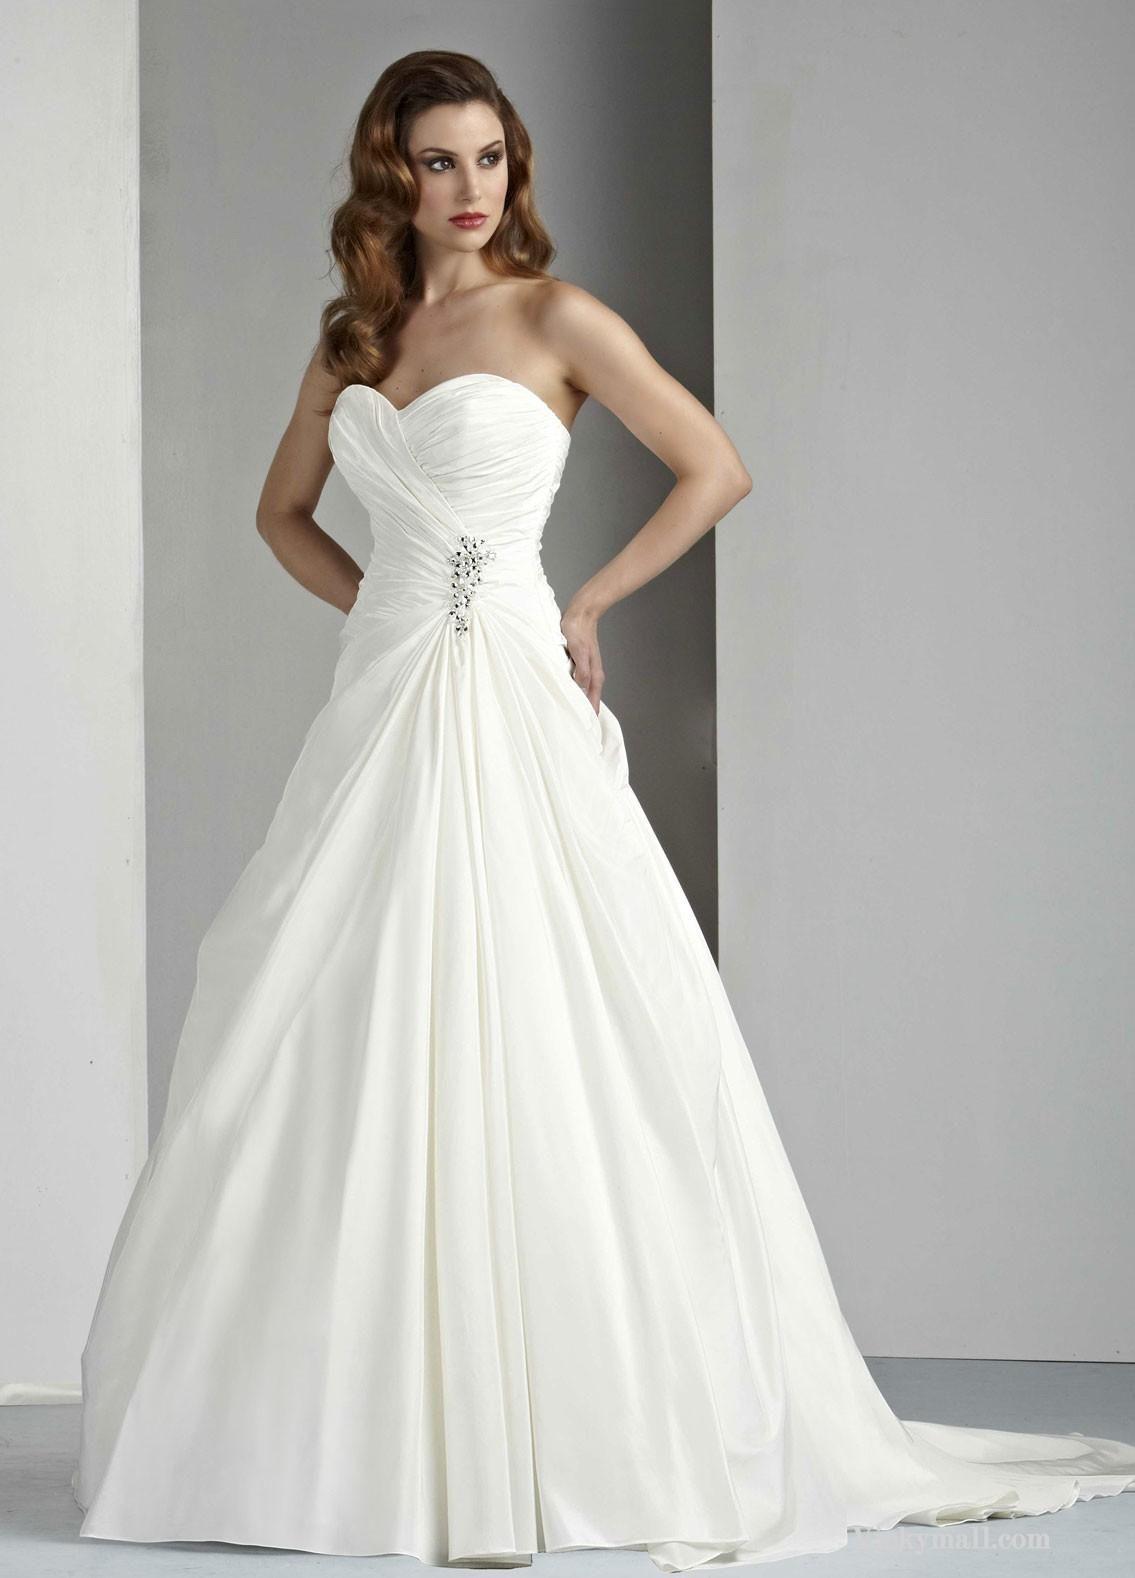 Sweetheart strapless wedding dress  Chic Designed Pure White Wedding Piece in Taffeta  Wedding dress